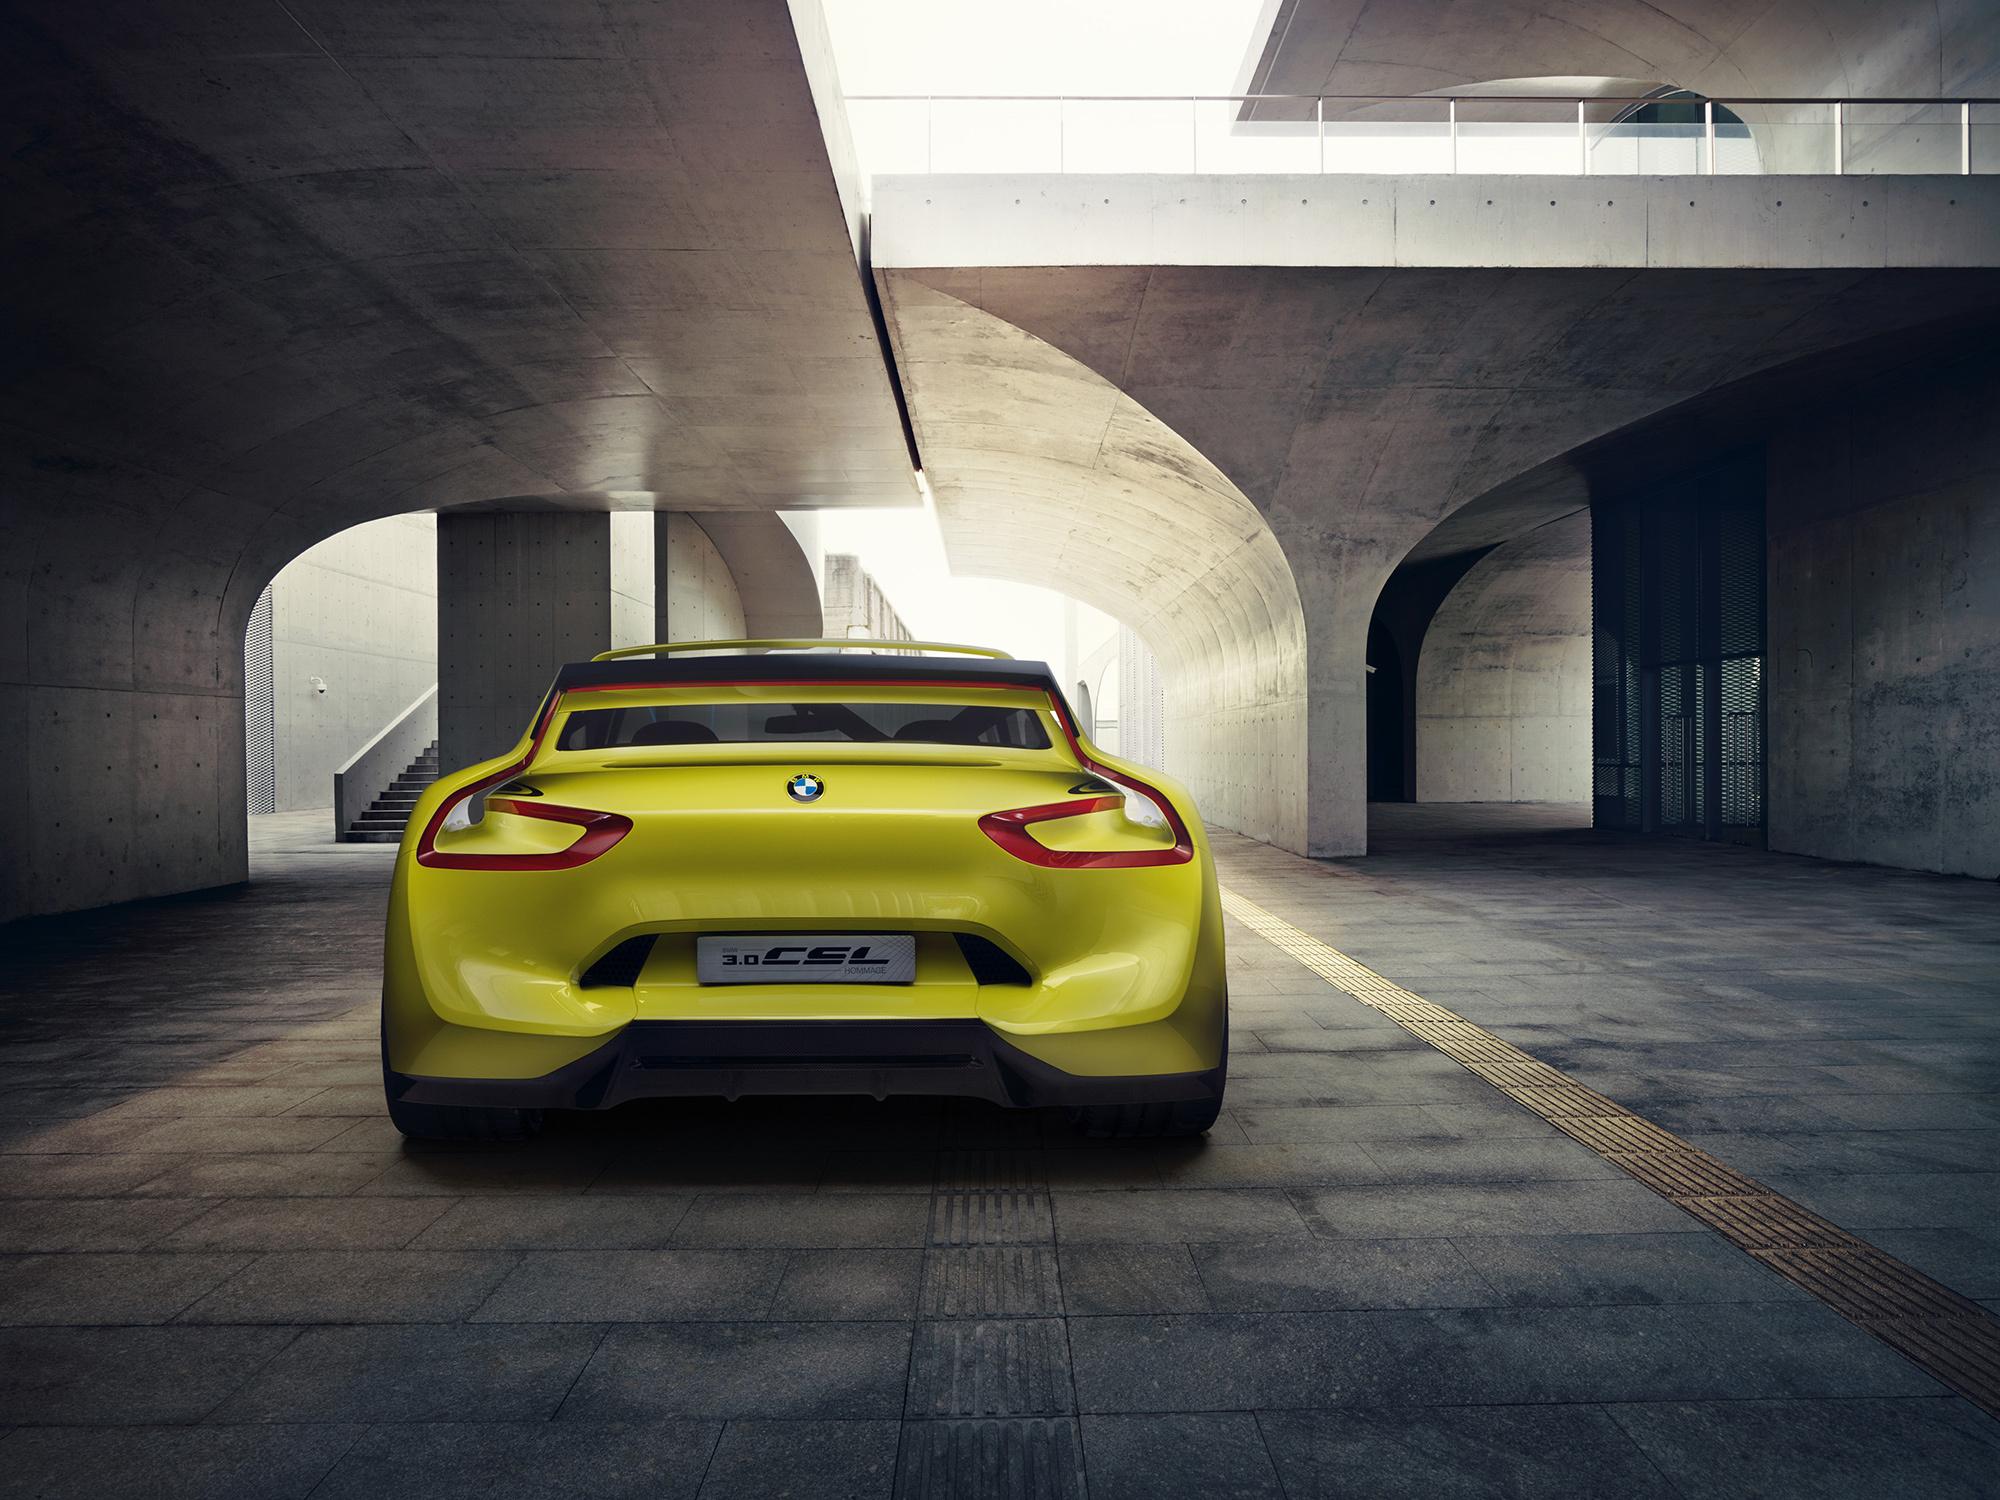 BMW 3.0 CSL Hommage Concept Pictures